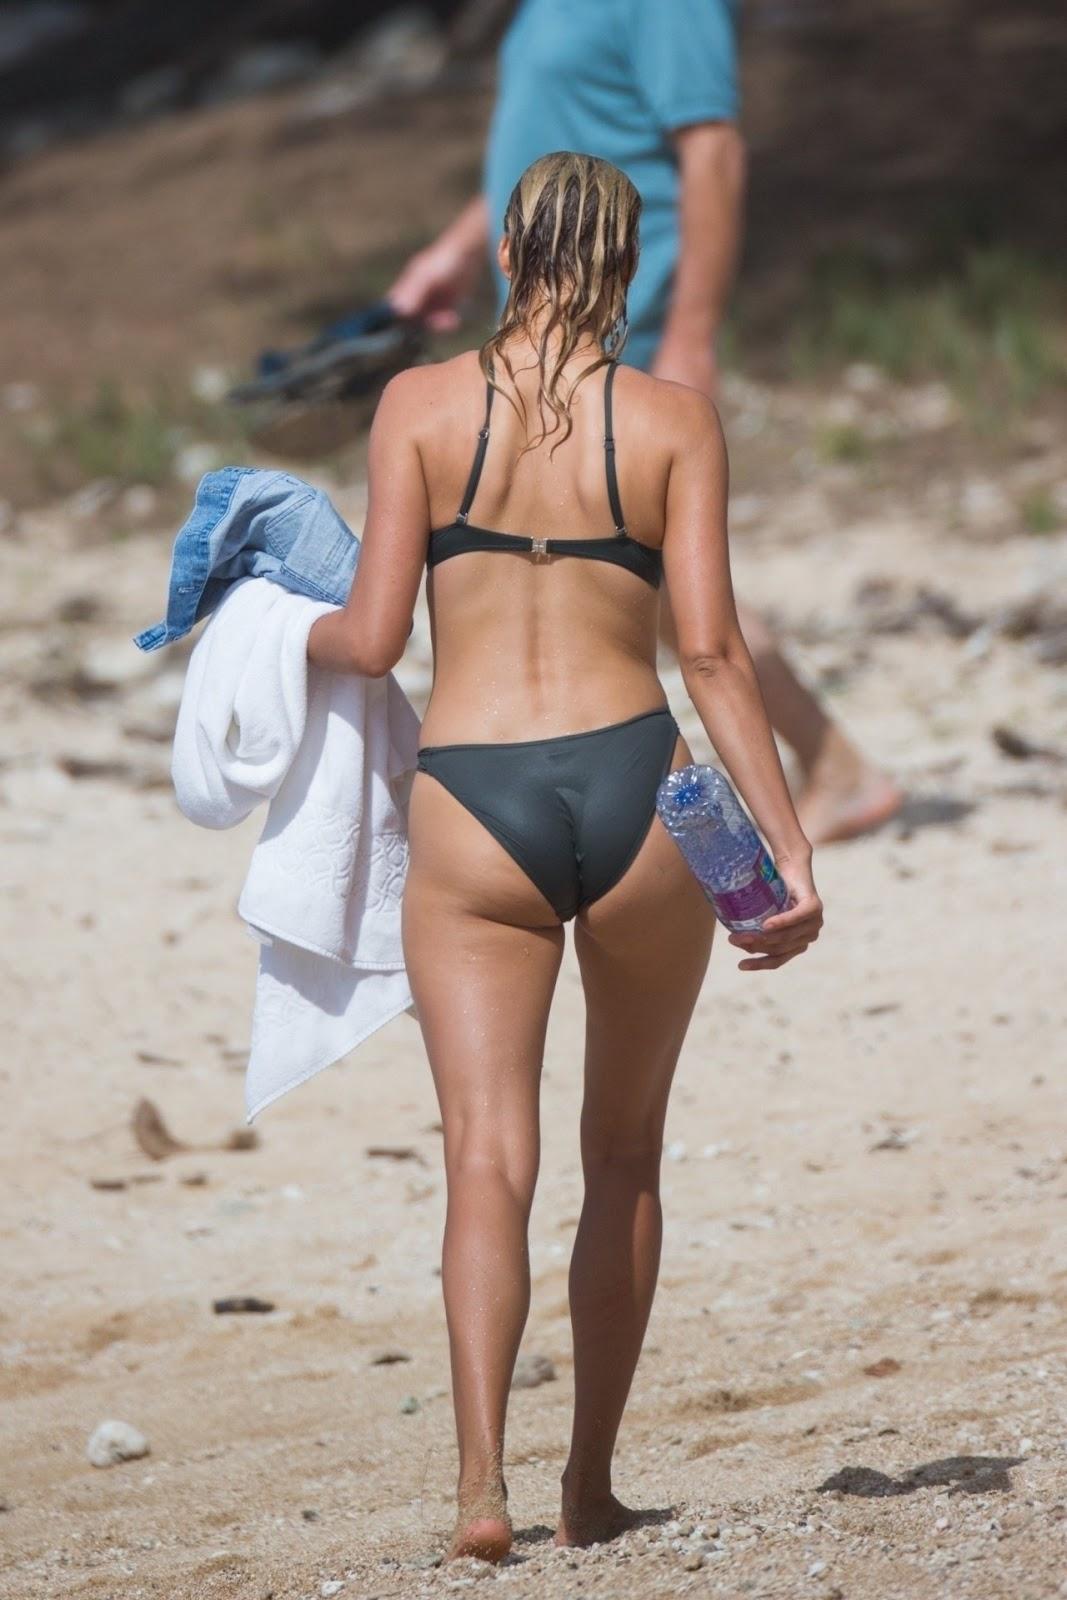 Beach Boobs! Kelly Rohrbach Goes TOPLESS In Hawaii (NSFW